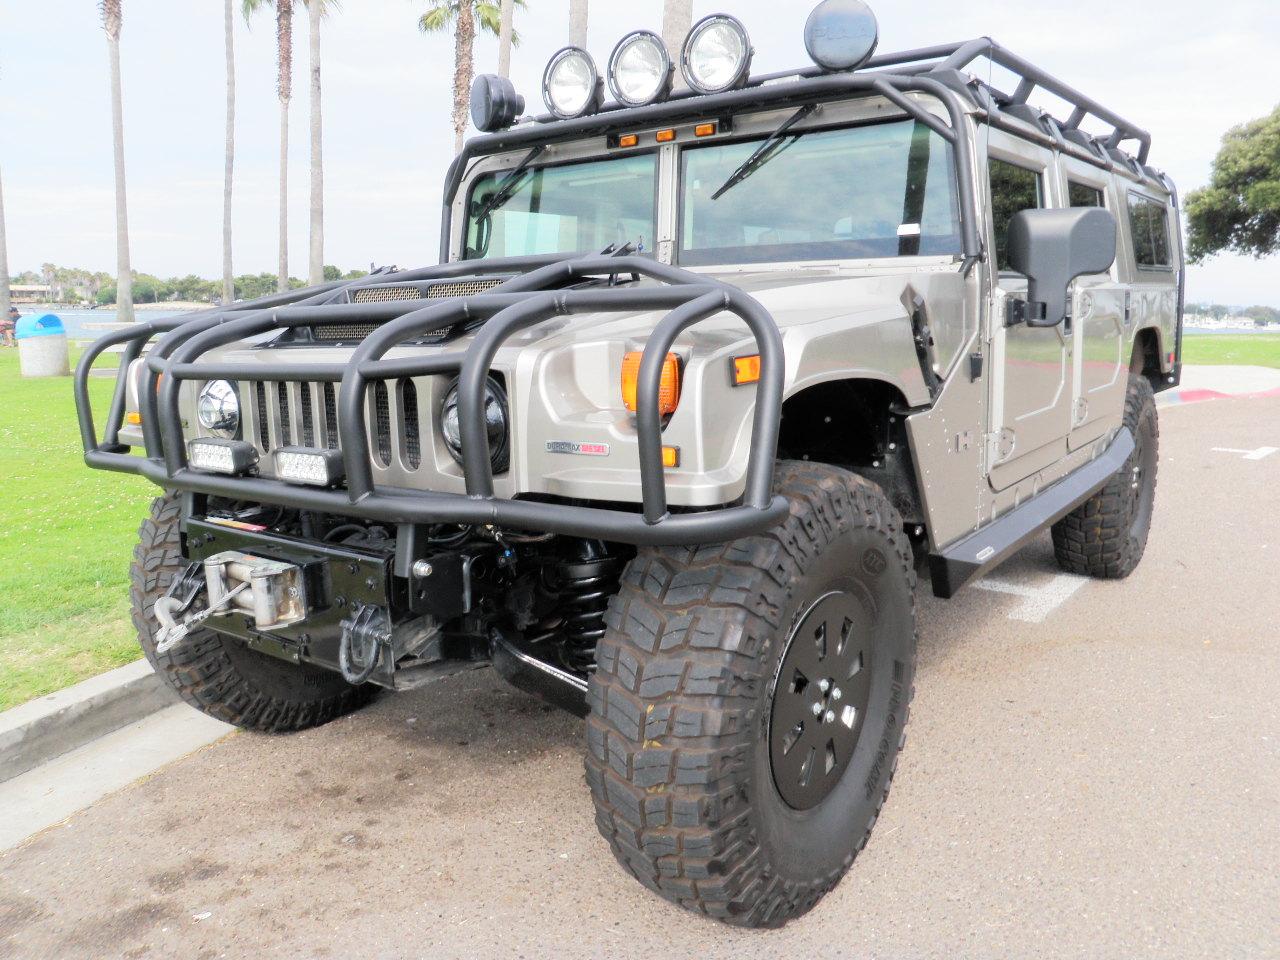 2006 Predator Hummer H1 Alpha Search And Rescue Wagon 9k